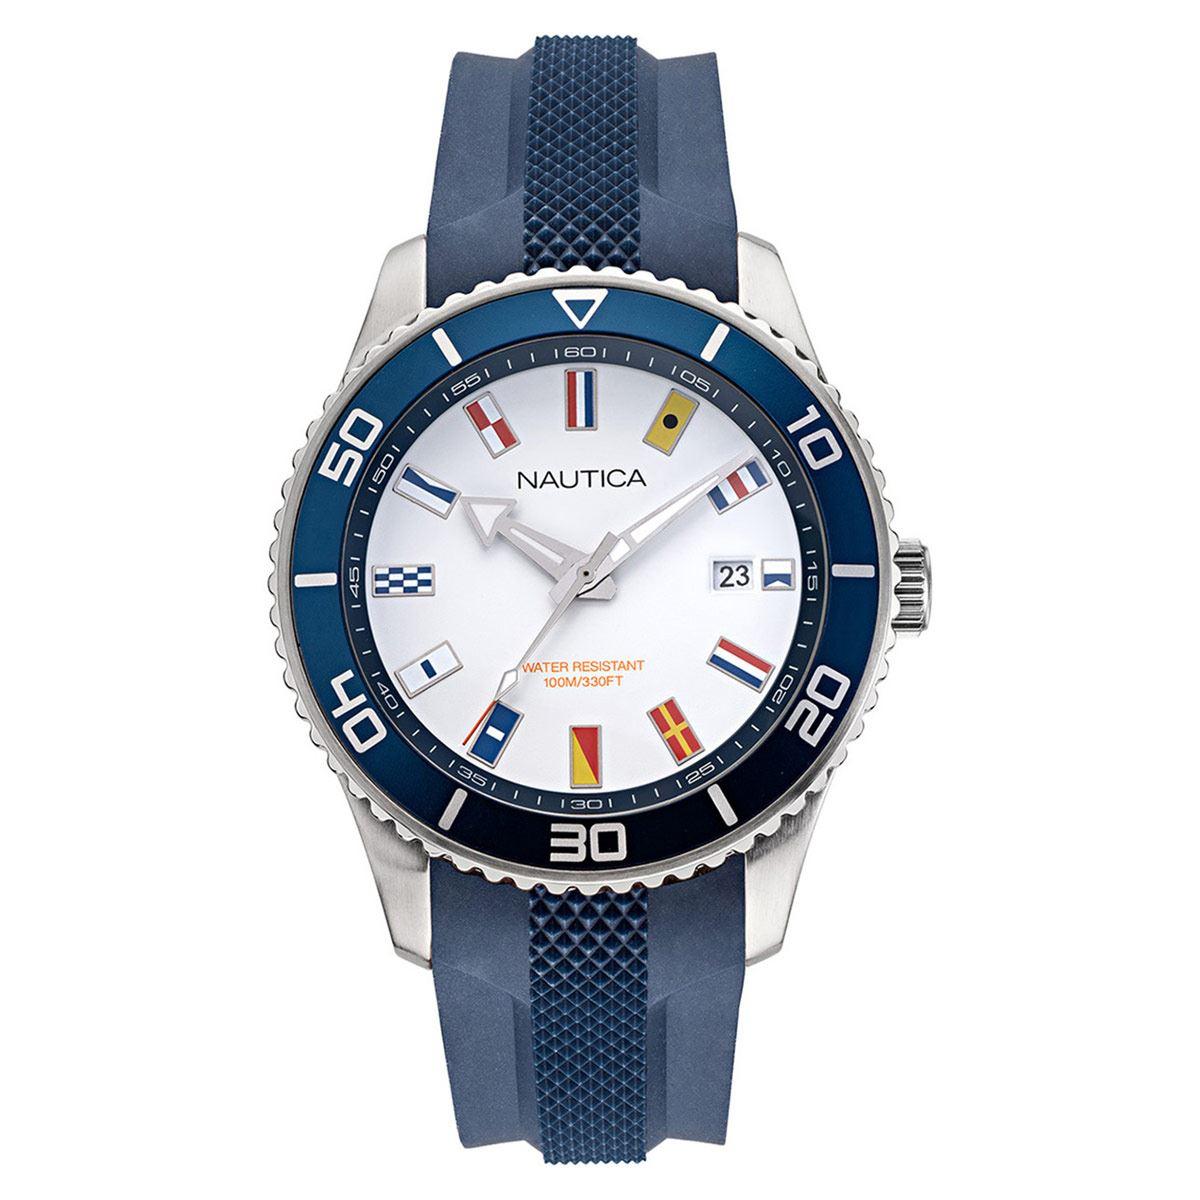 Reloj Nautica Azul Navy NAPPBF914